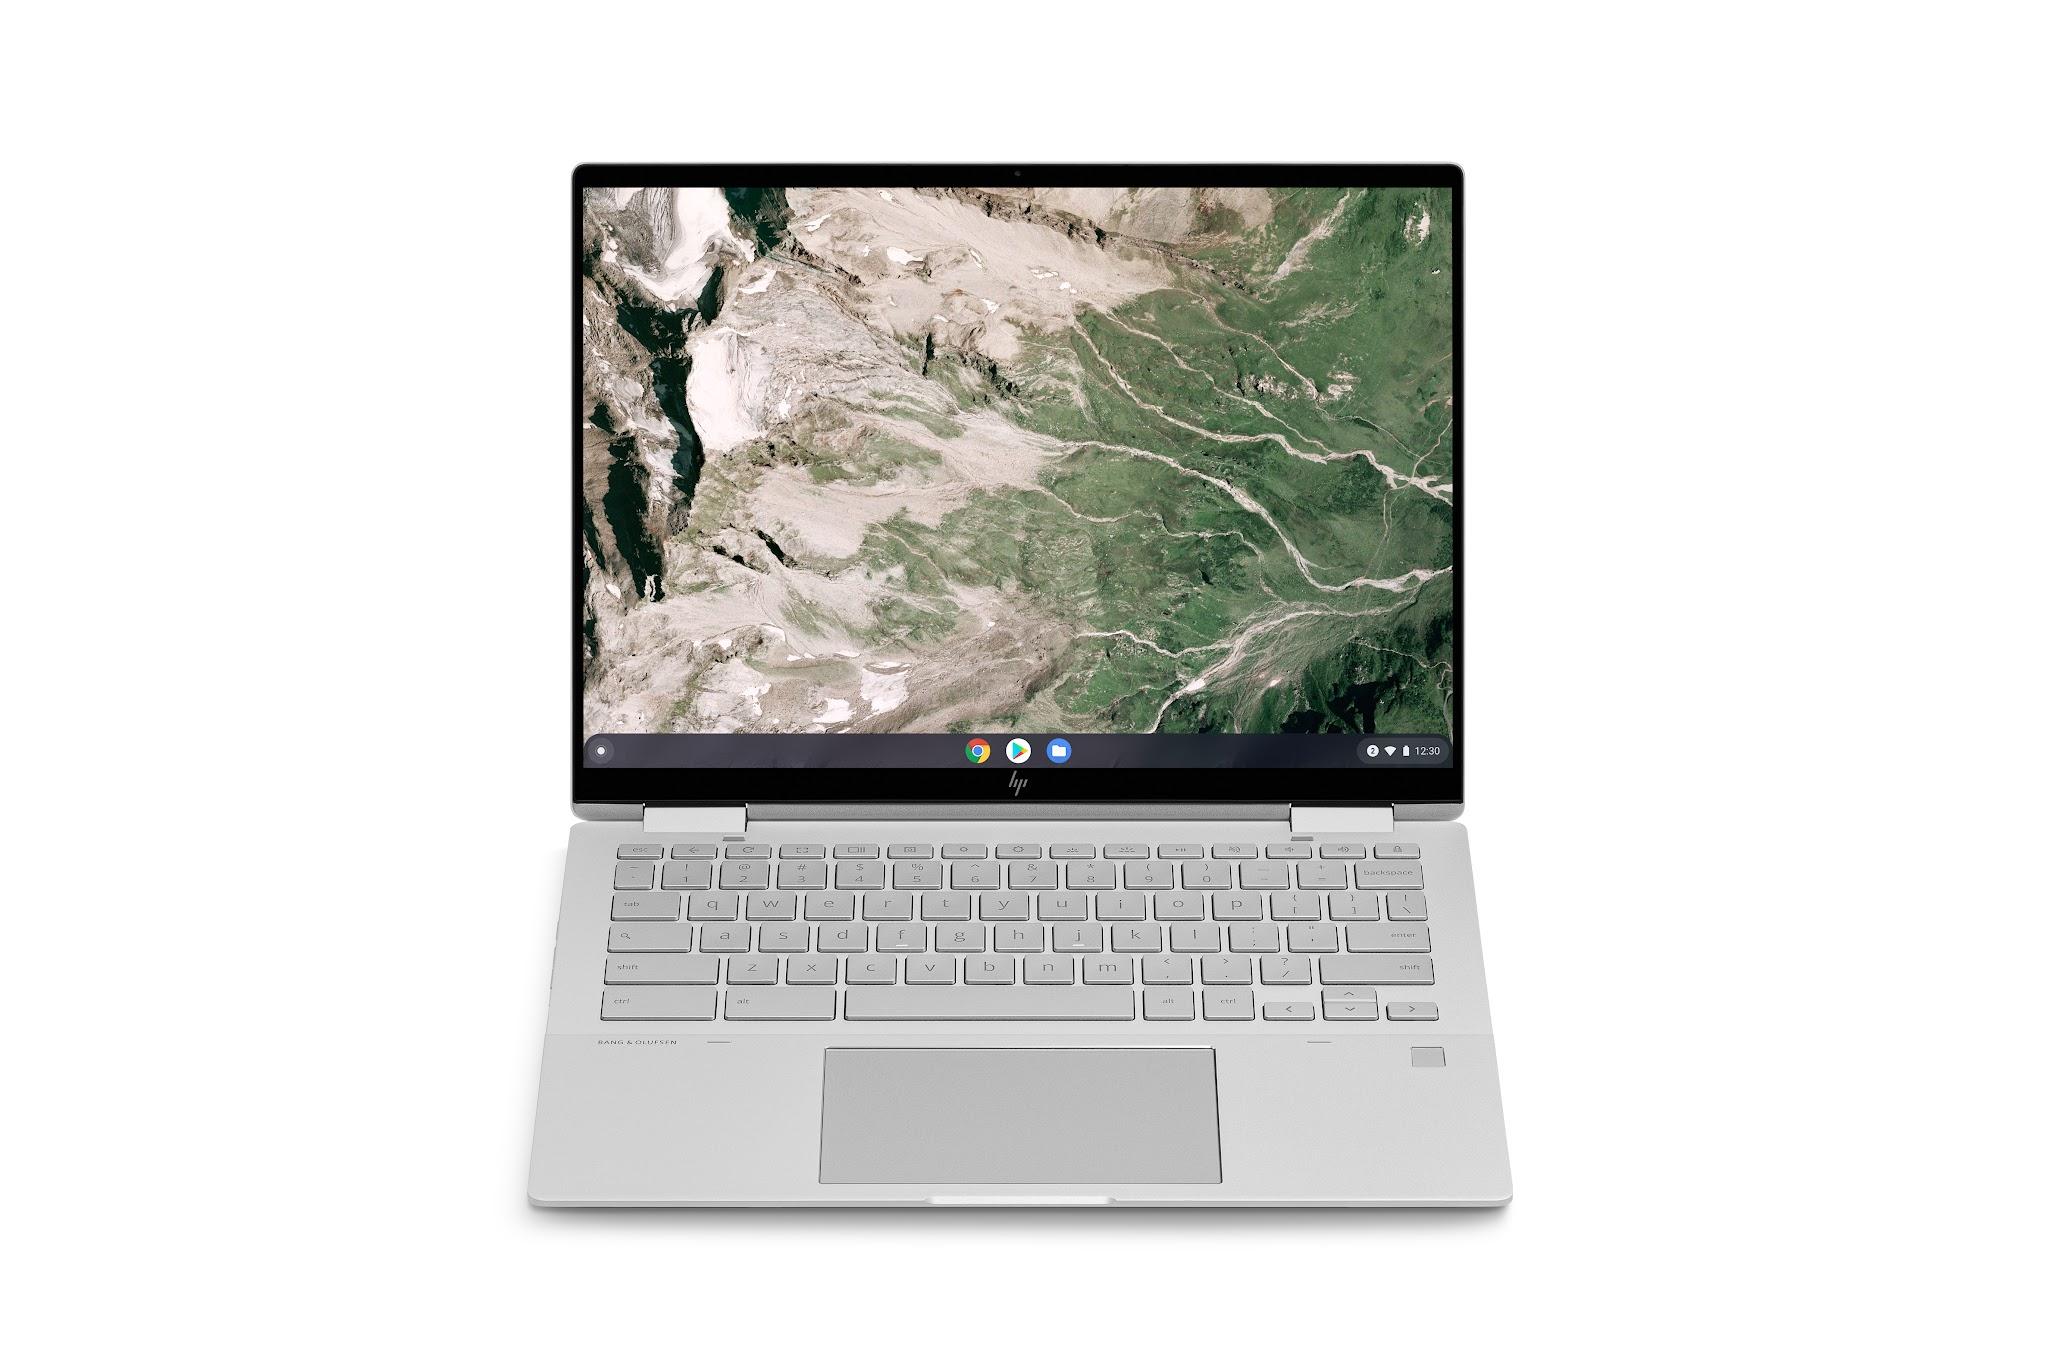 HP Chromebook x360 13c - photo 2